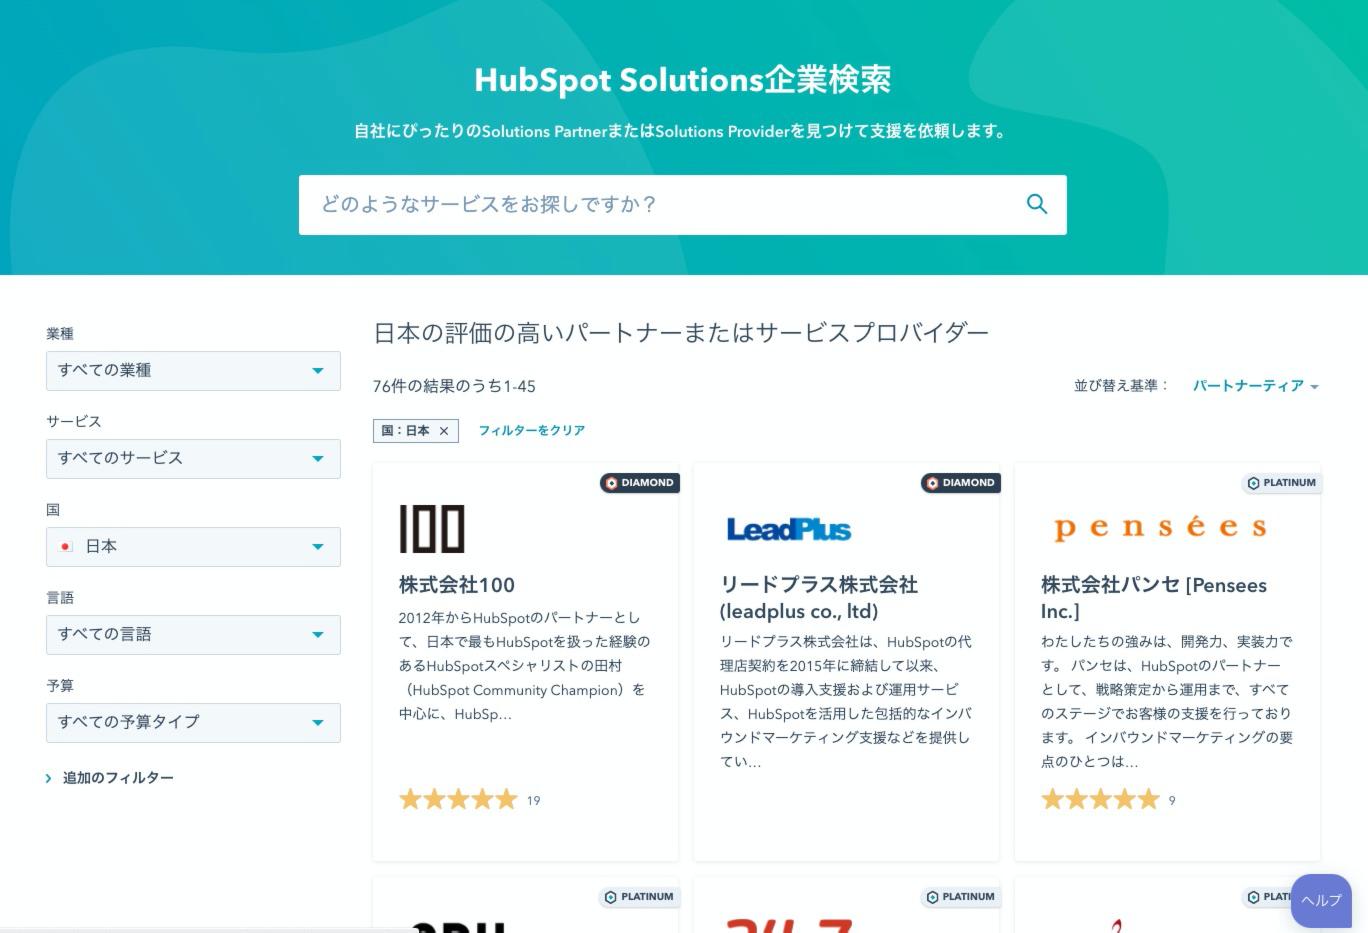 HubSpot社公式パートナー検索ページのキャプチャ